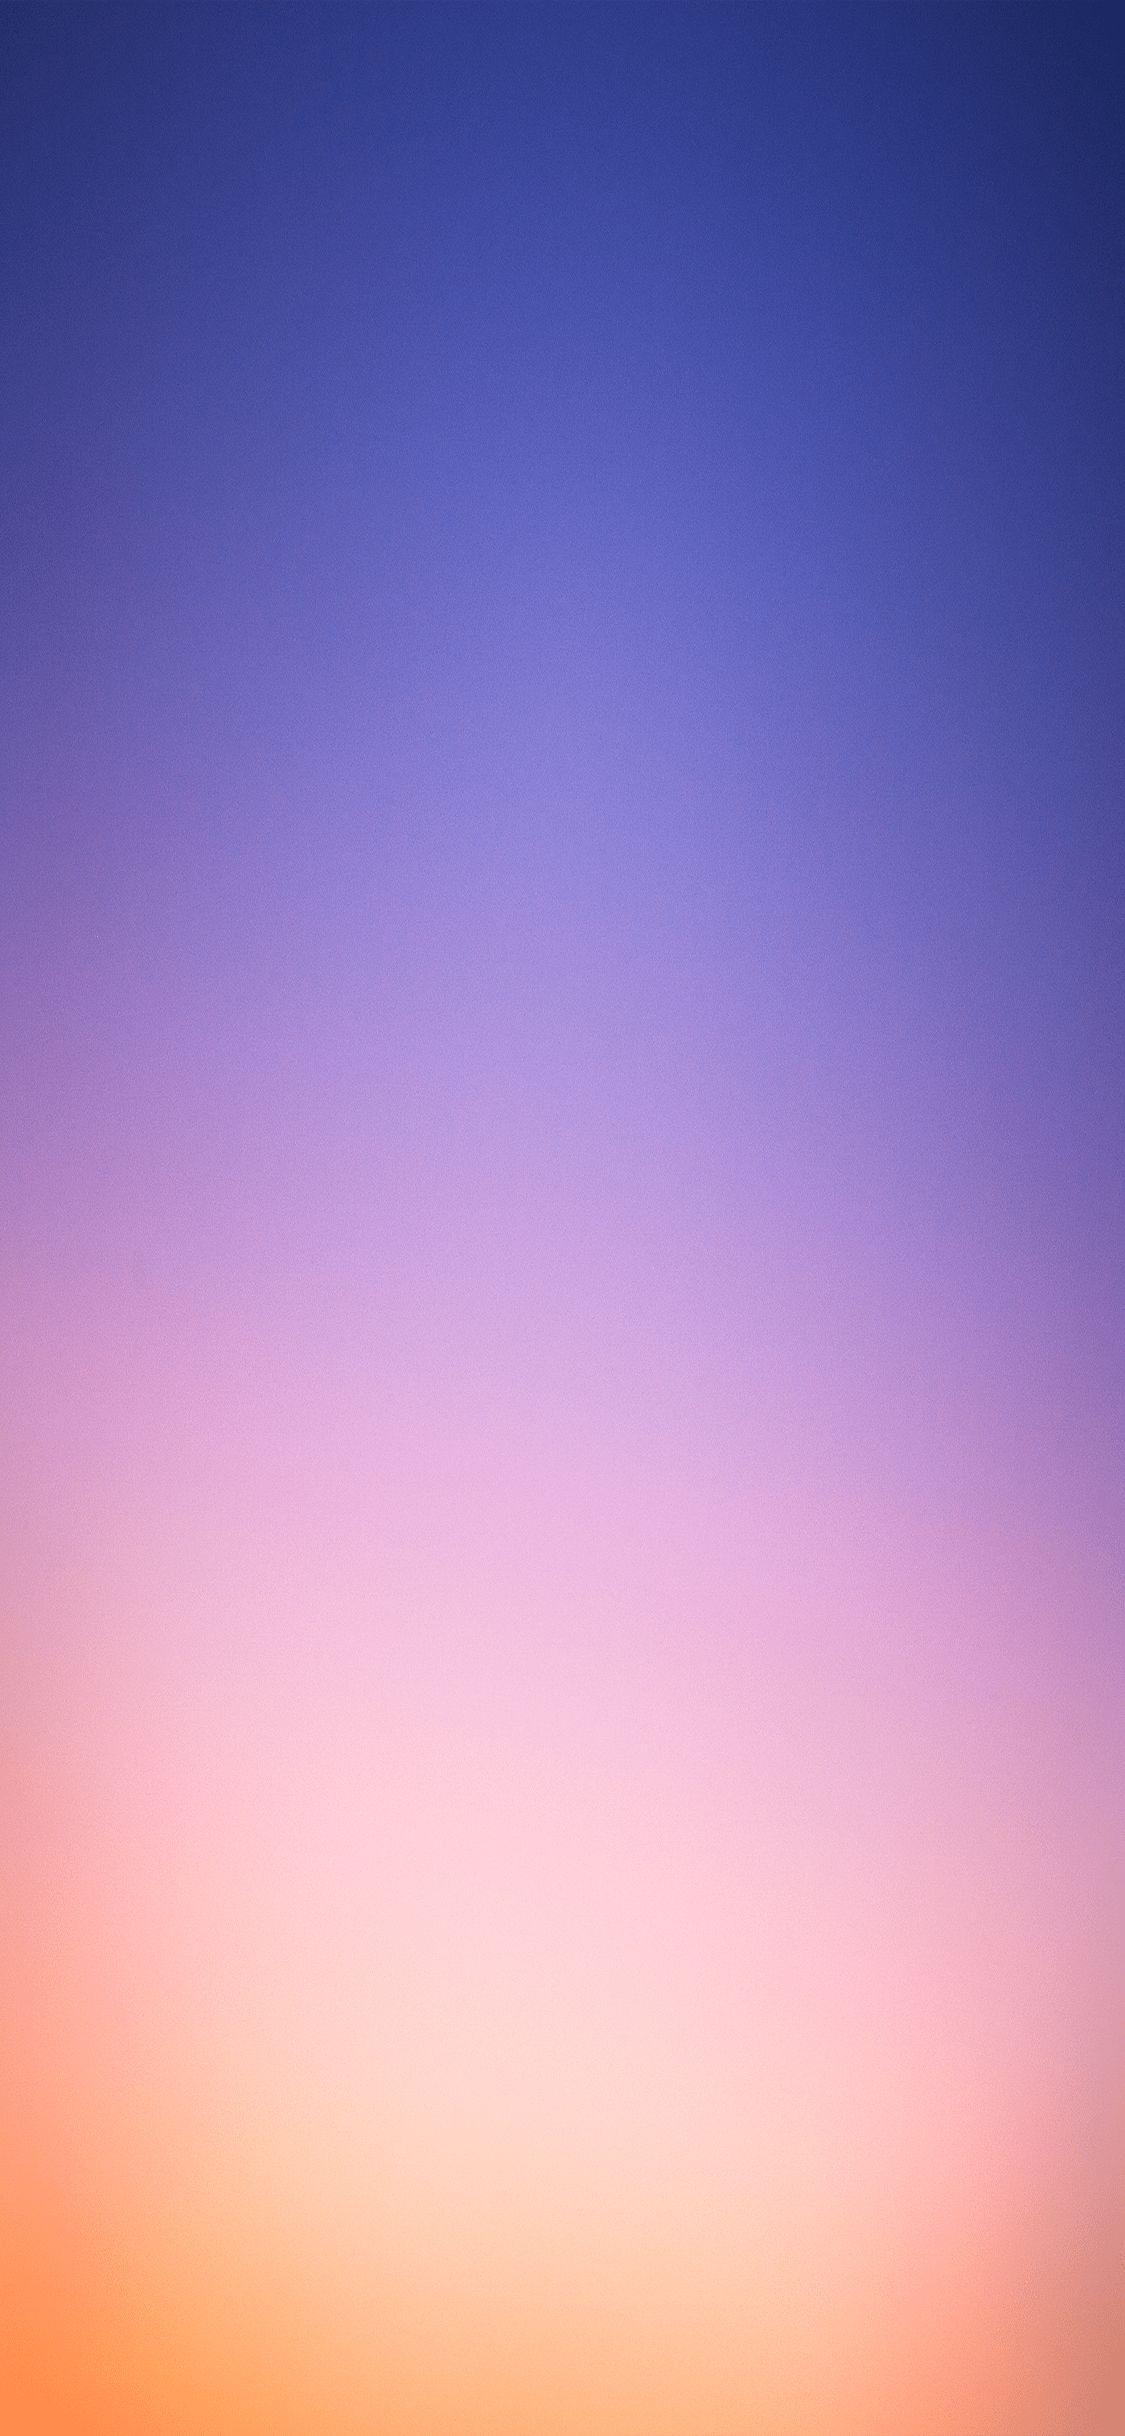 iPhone X Xs High Resolution Wallpaper Stunning Ombre